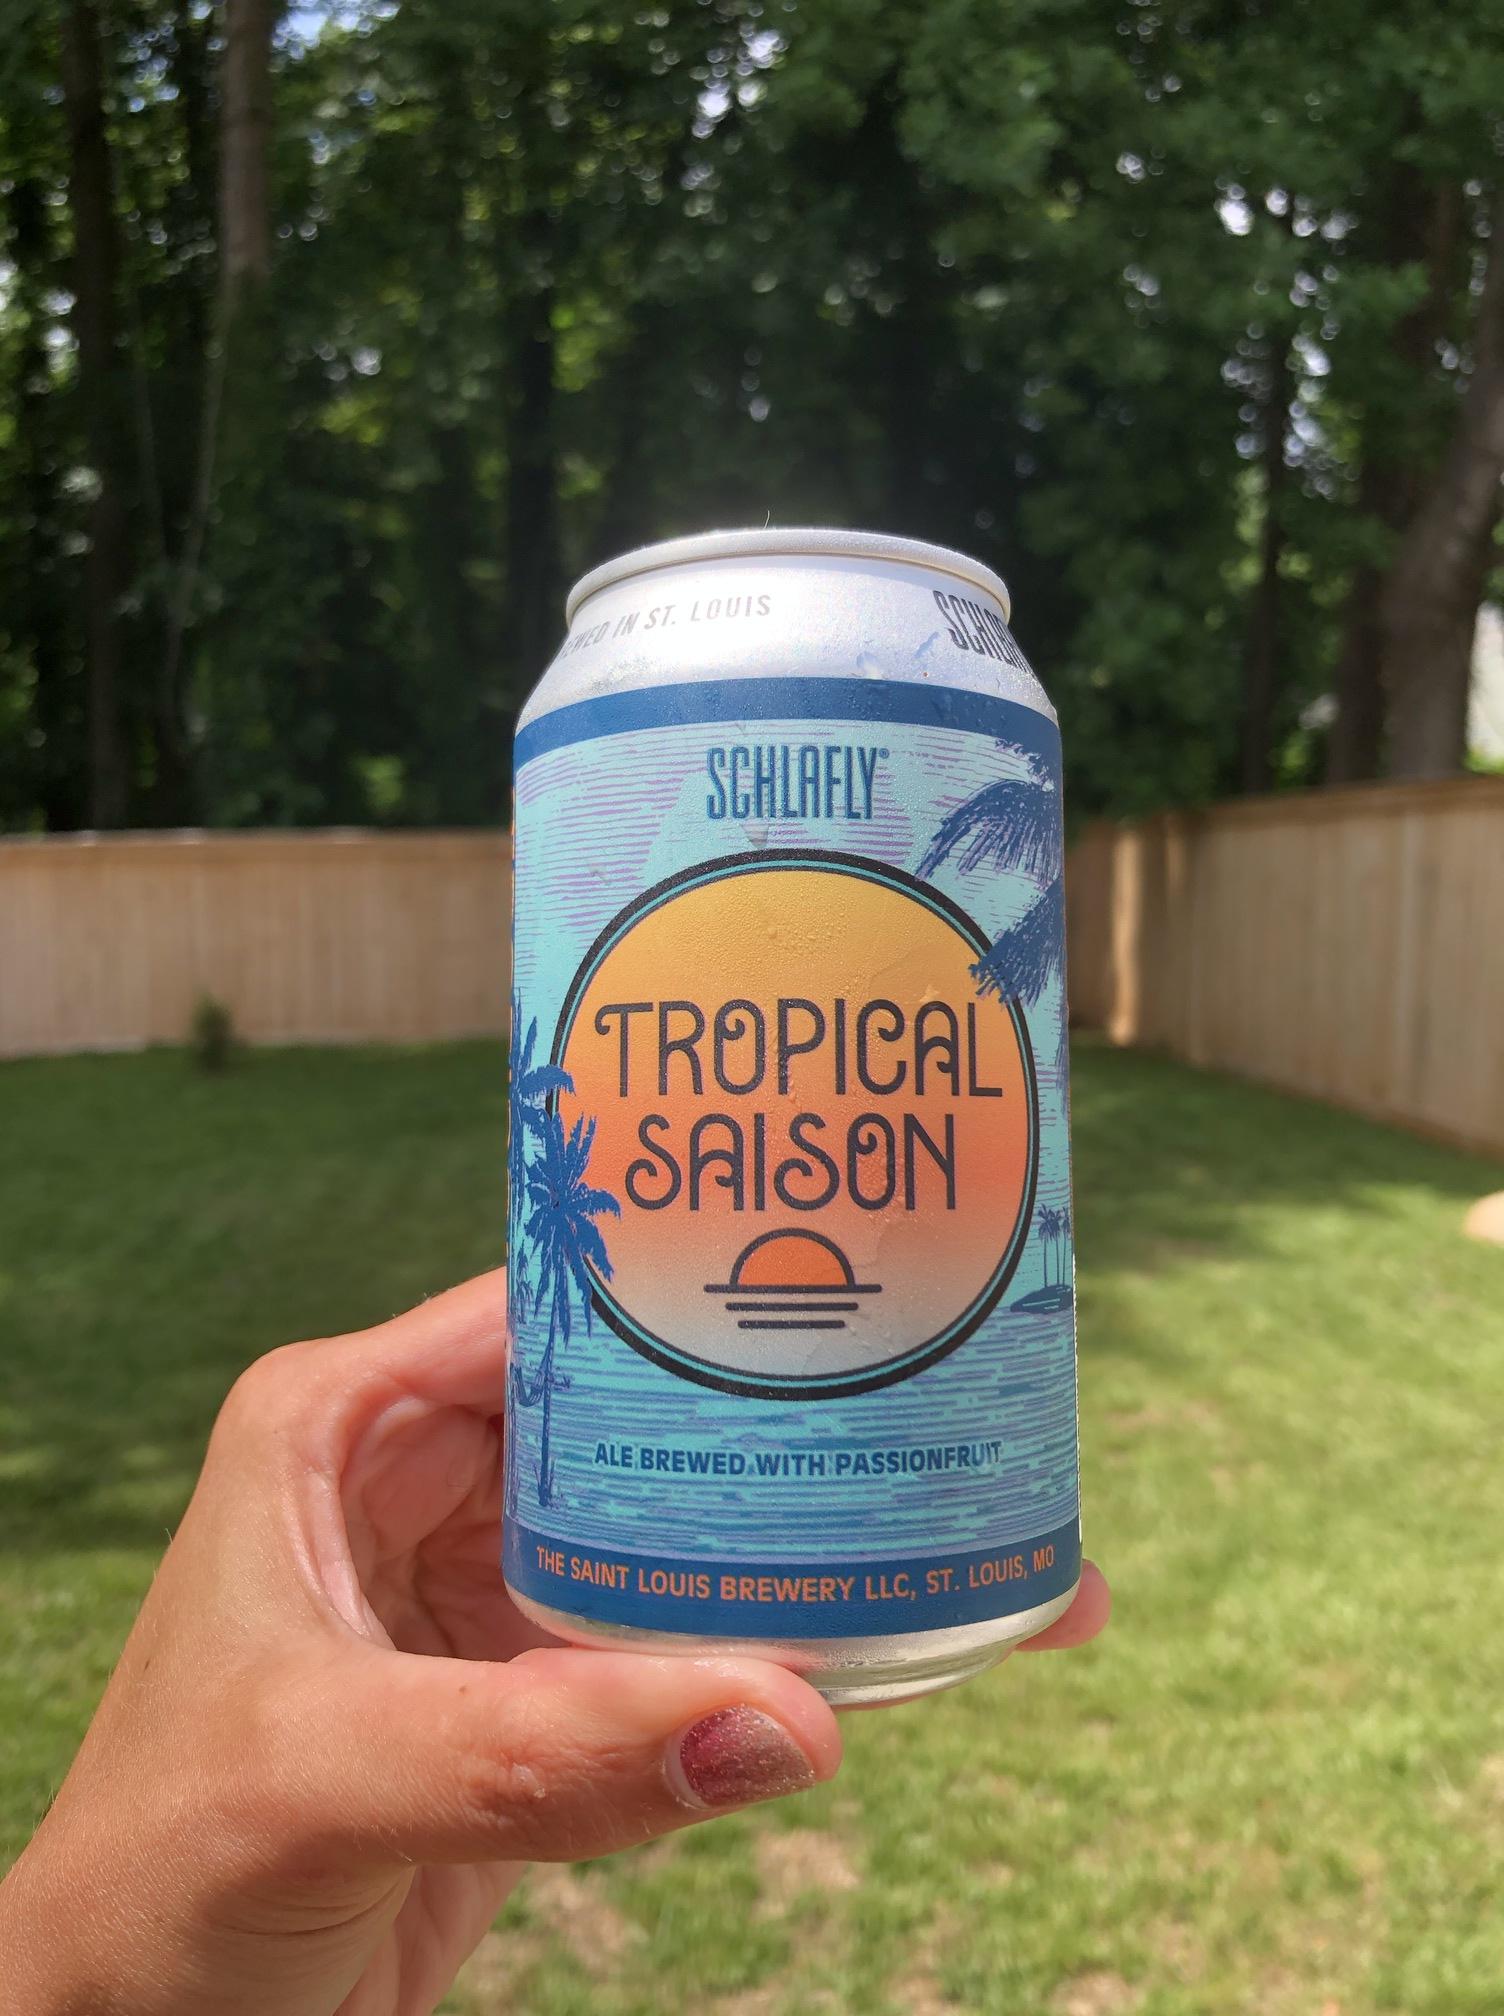 Schlafly Tropical Saison